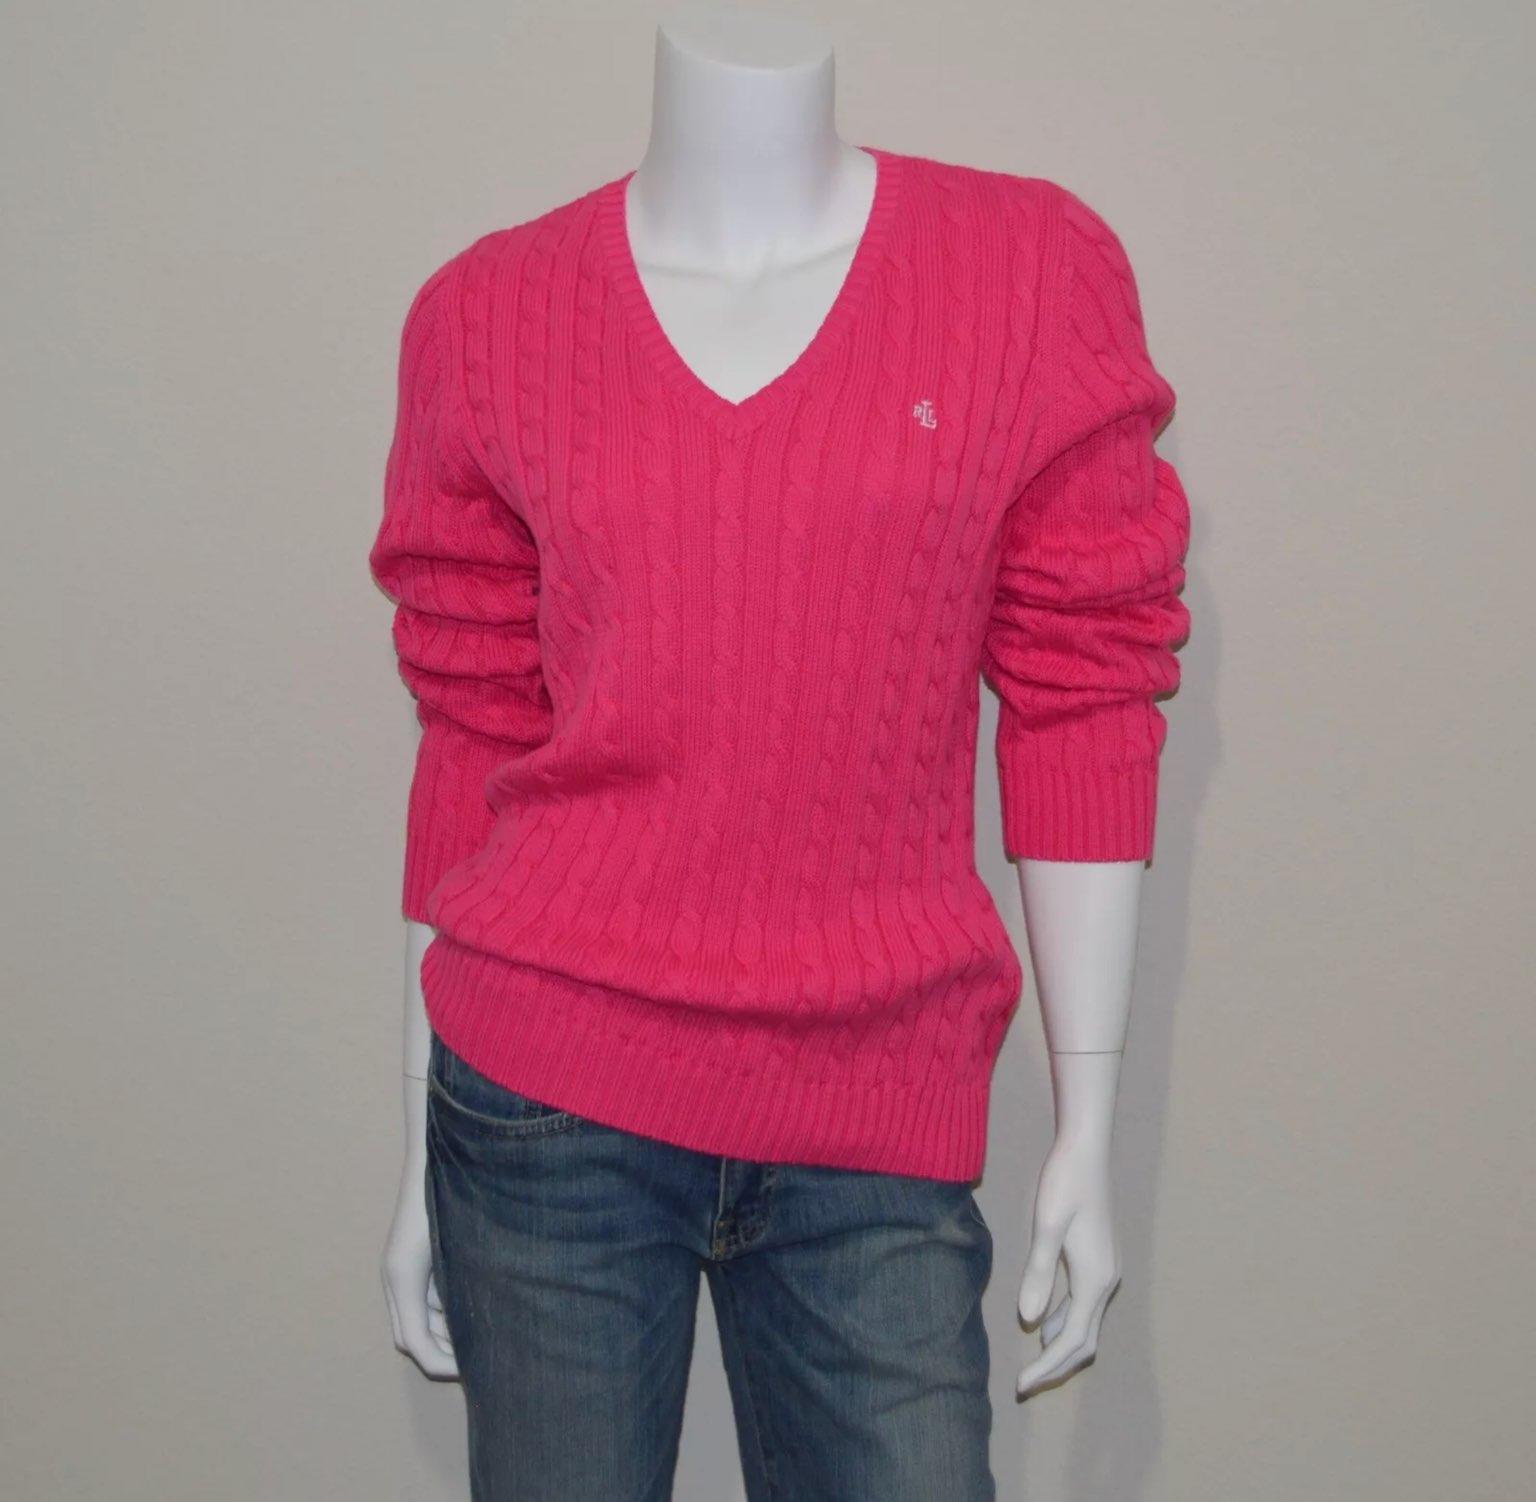 Lauren Ralph Lauren Cable Knit Sweater M - Mercari: BUY & SELL ...